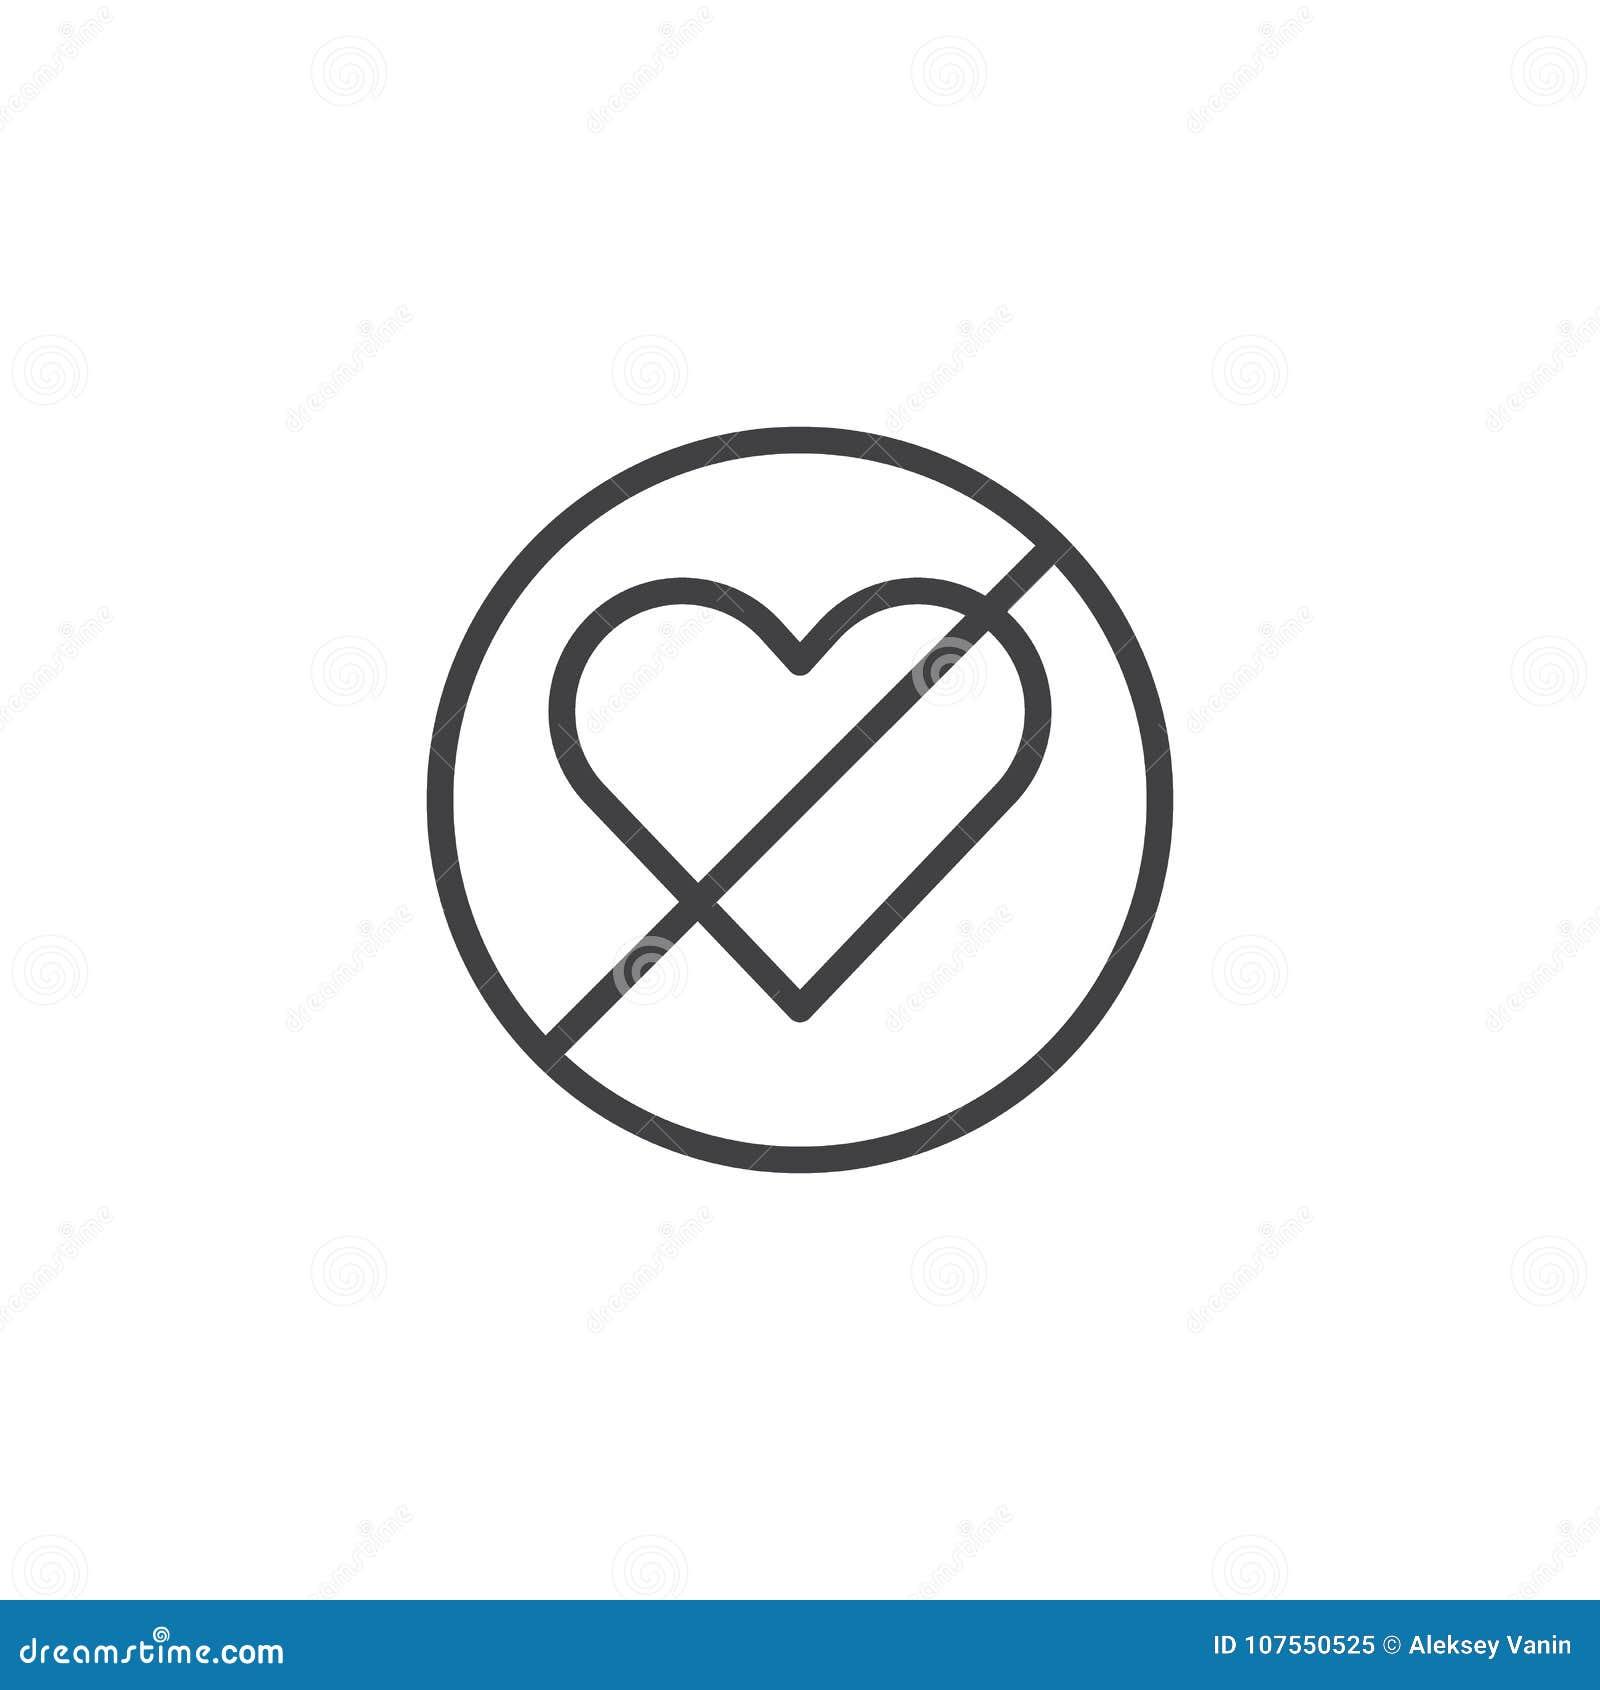 Forbidden Love Line Icon Stock Vector Illustration Of Editable